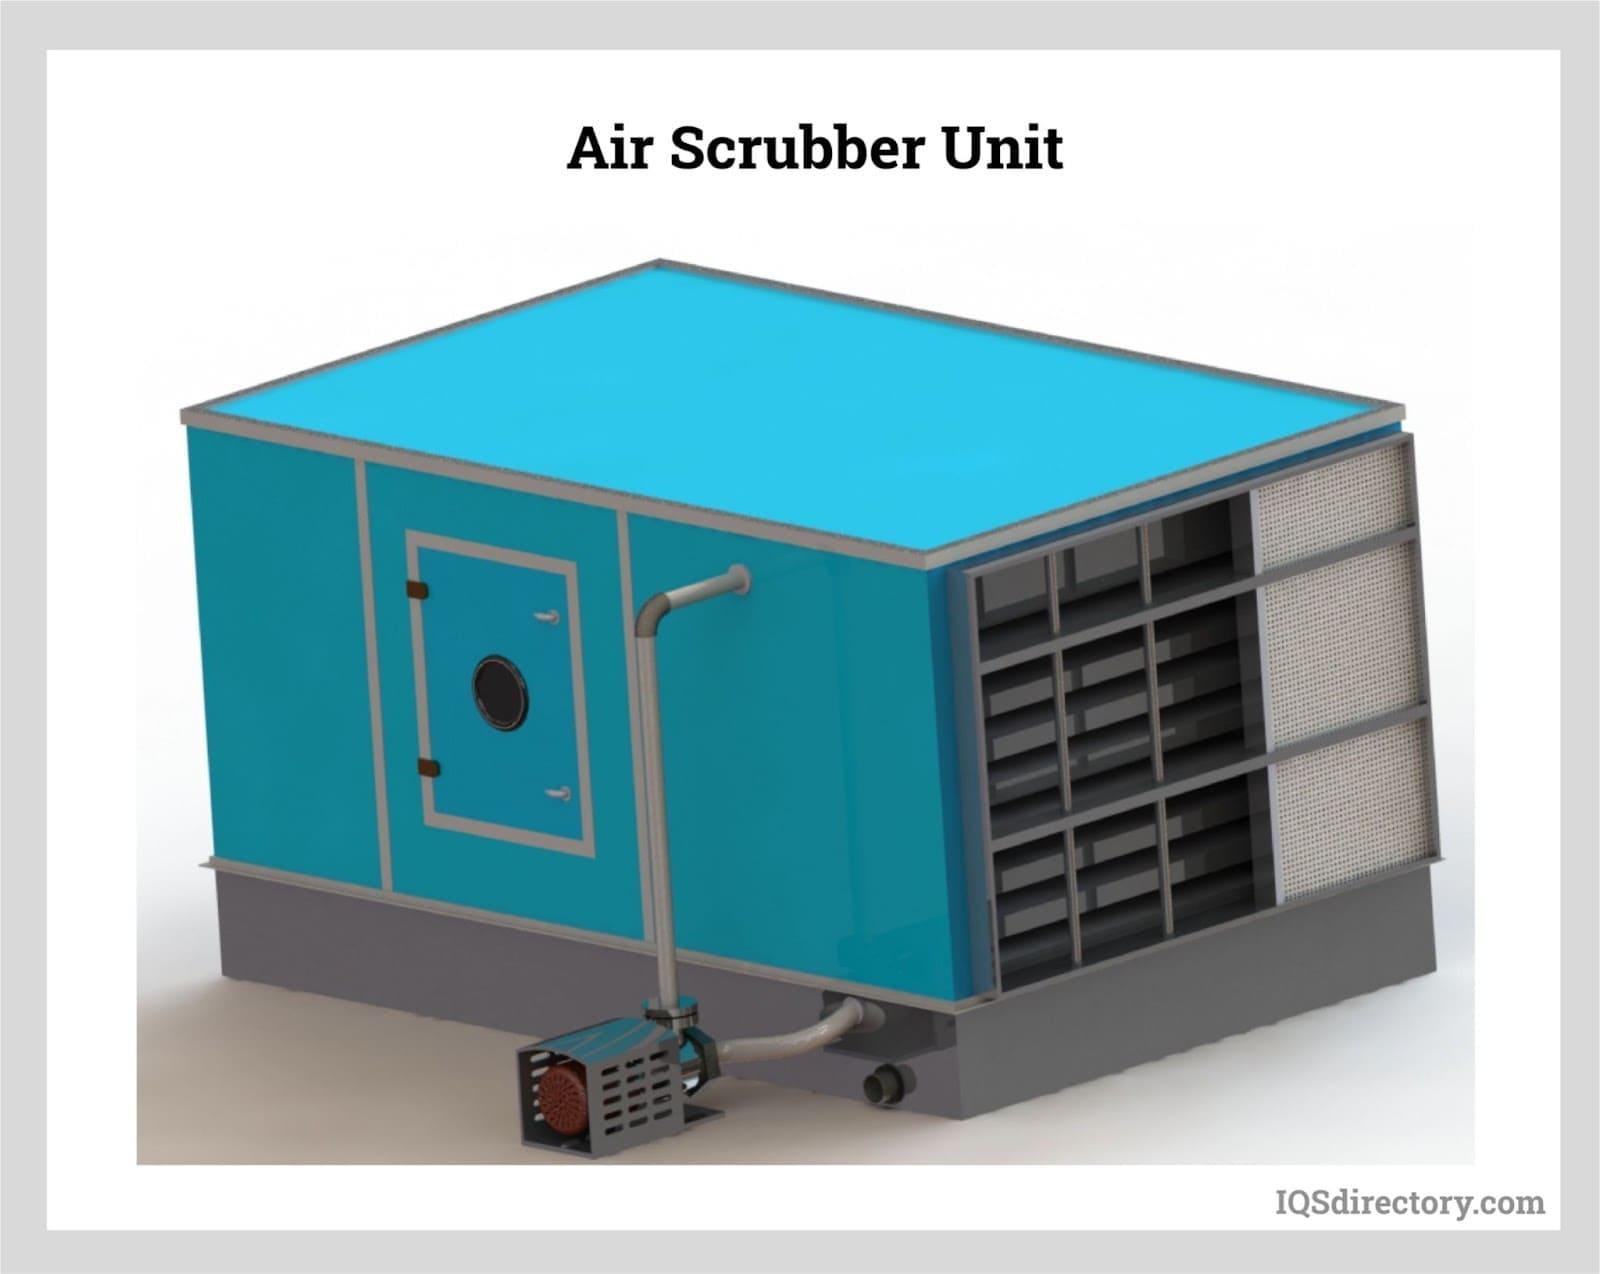 Air Scrubber Unit